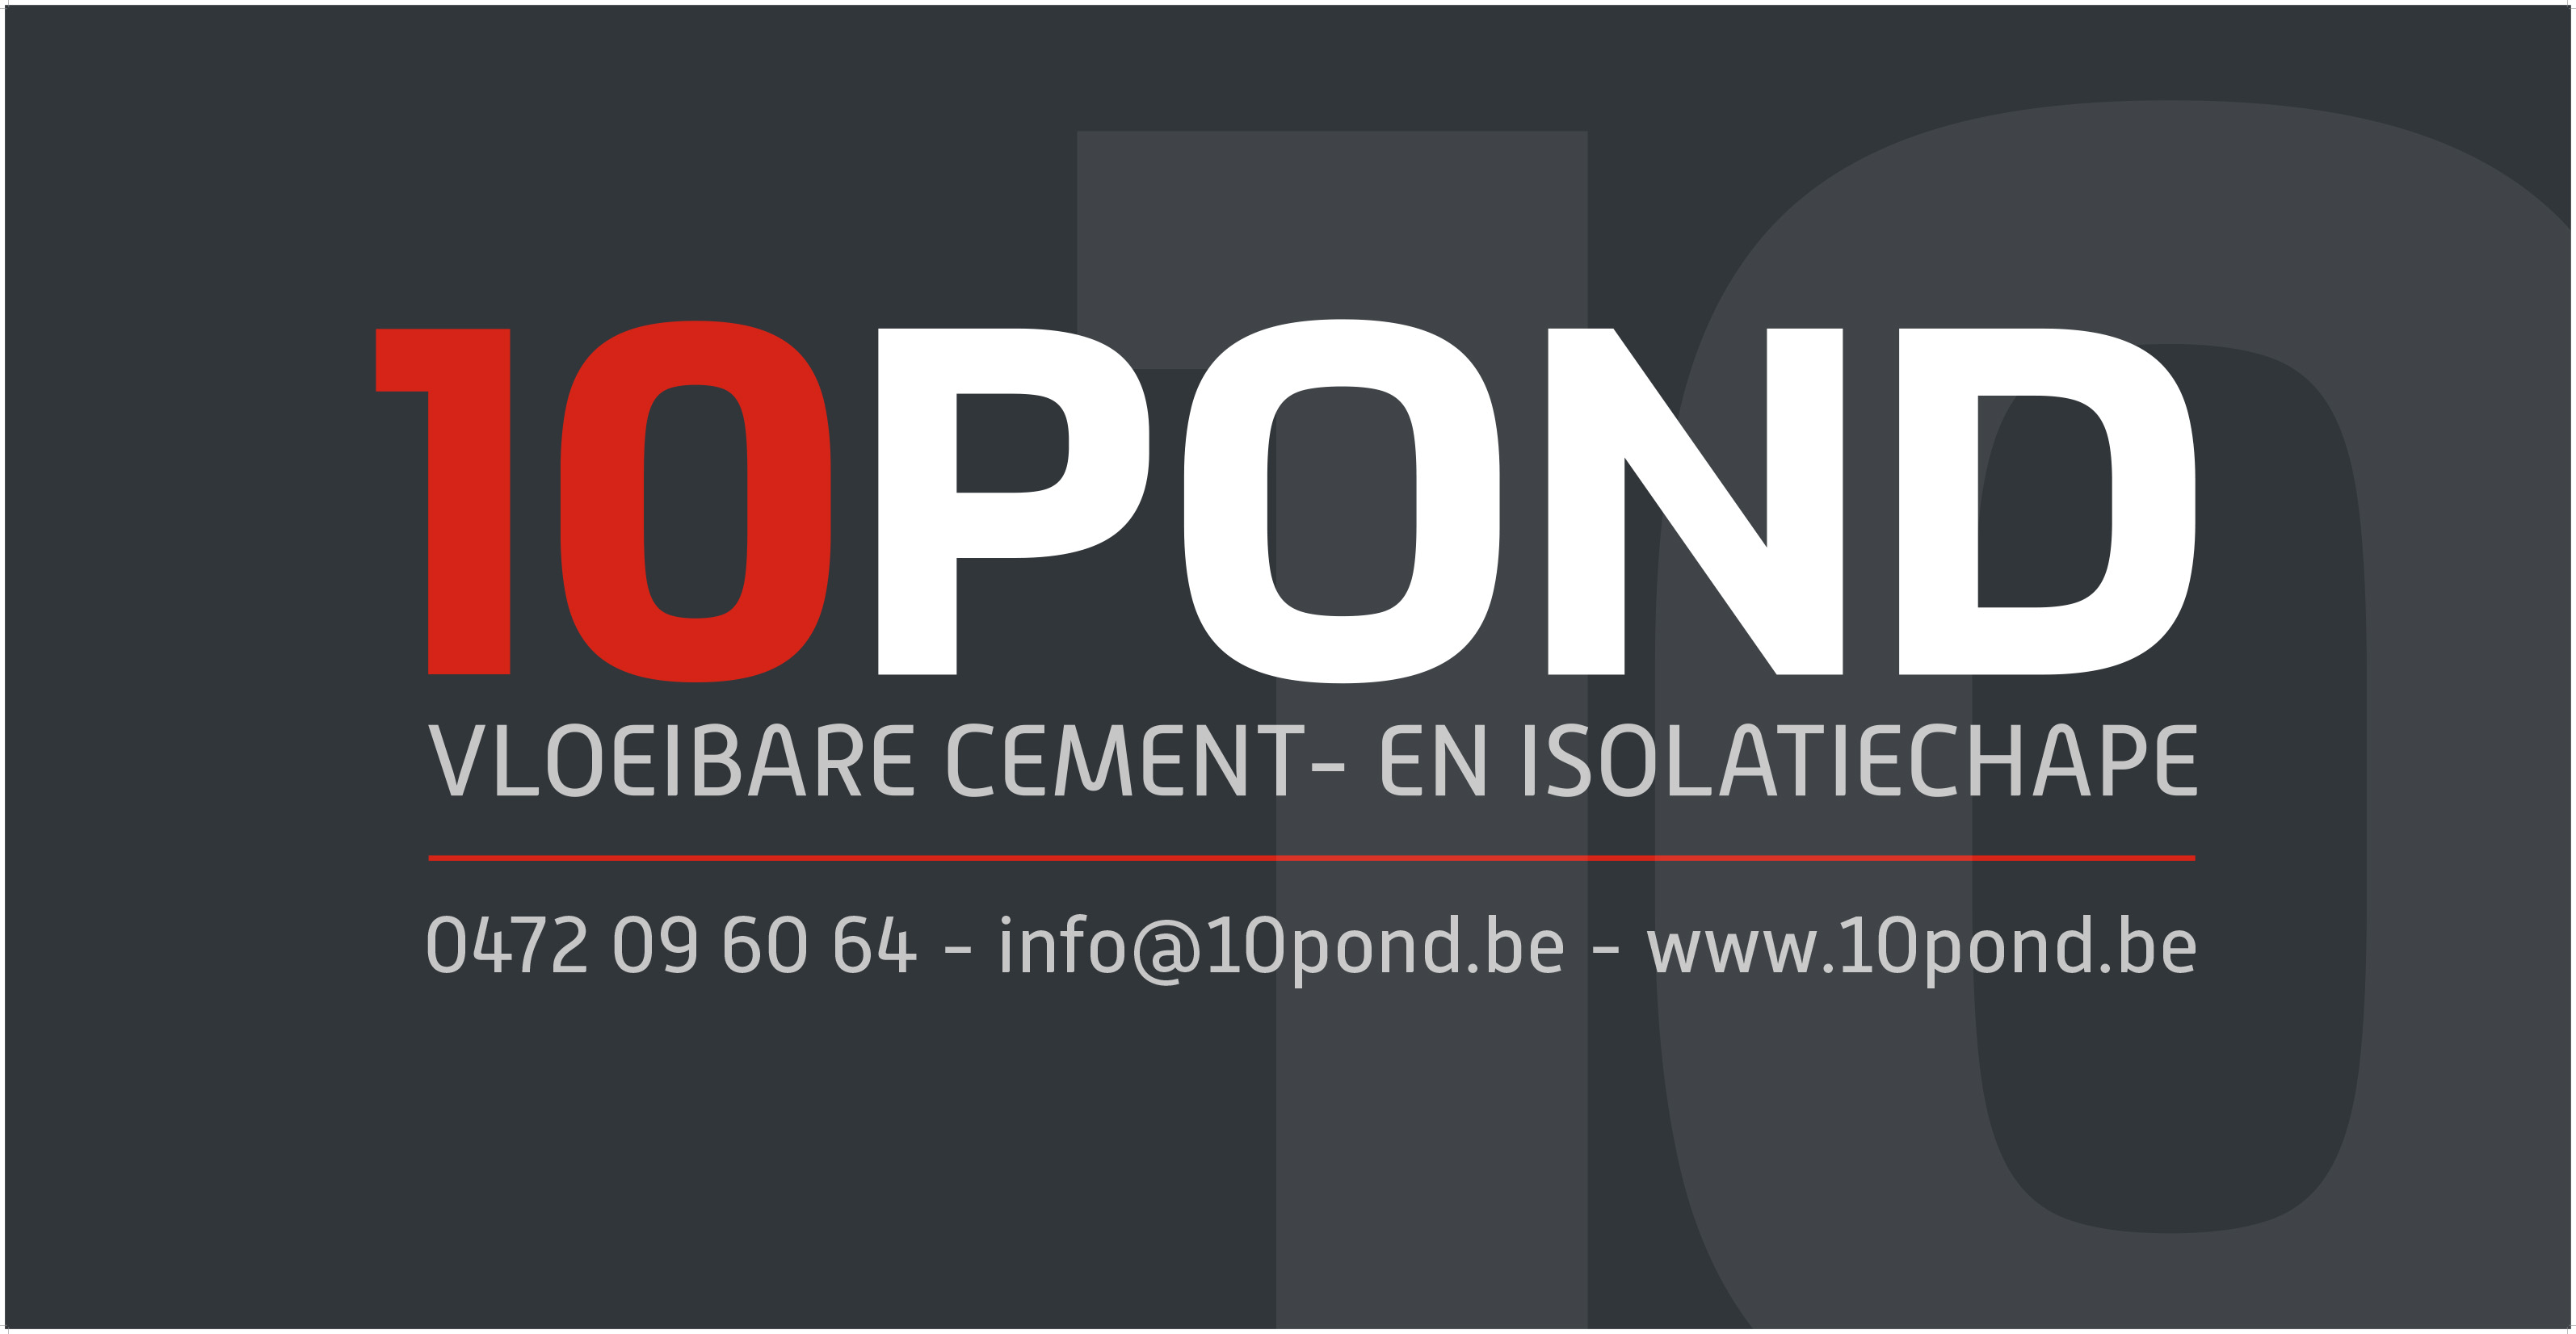 10POND